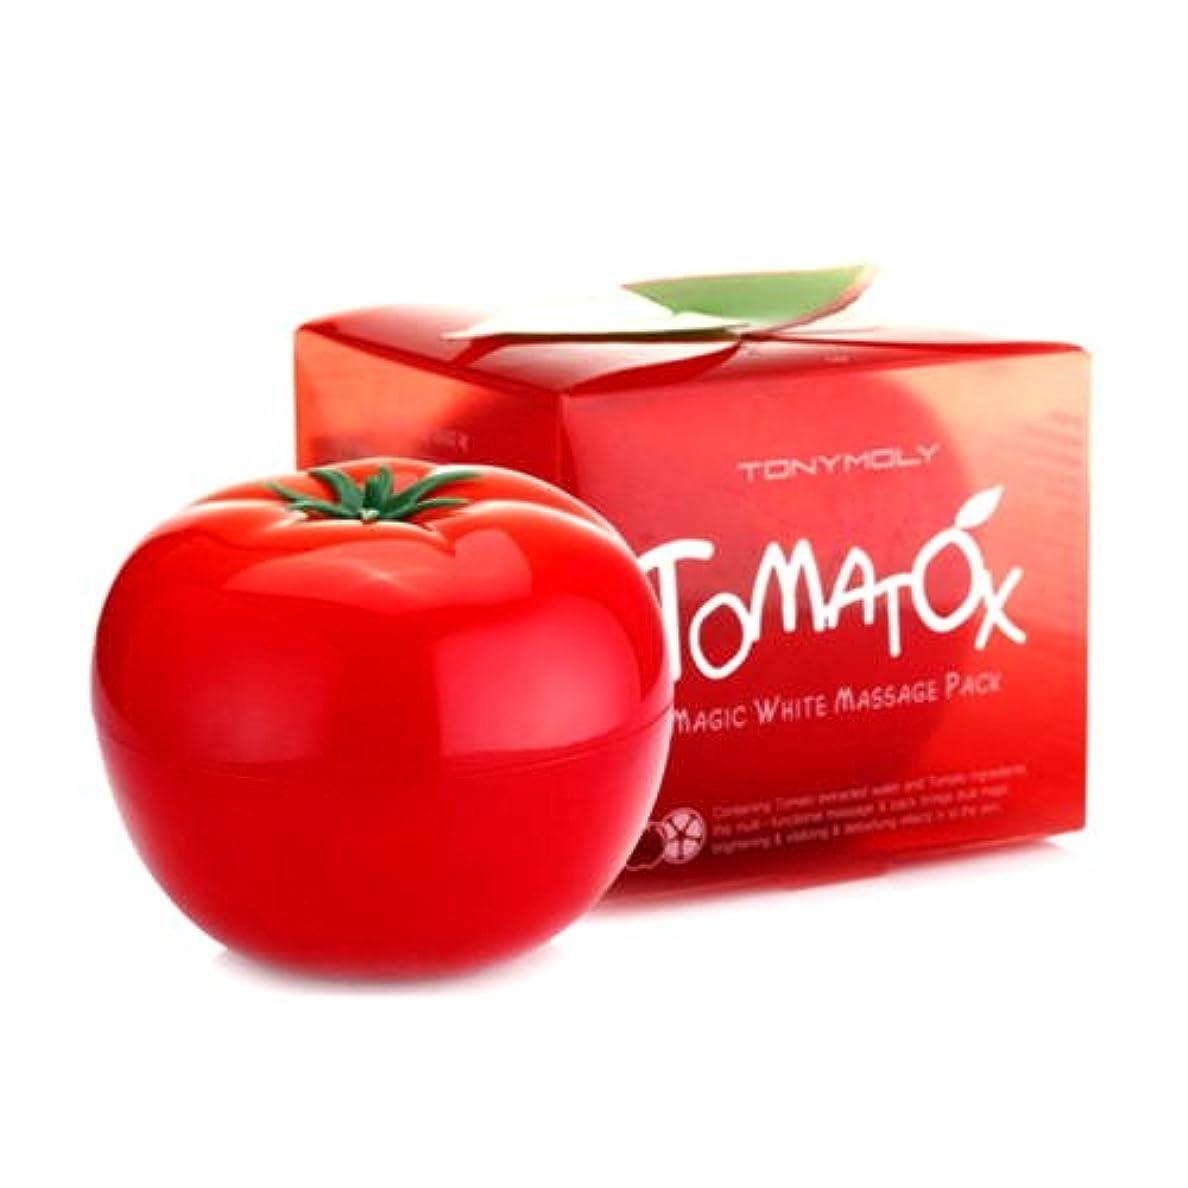 (3 Pack) TONYMOLY Tomatox Magic Massage Pack (並行輸入品)